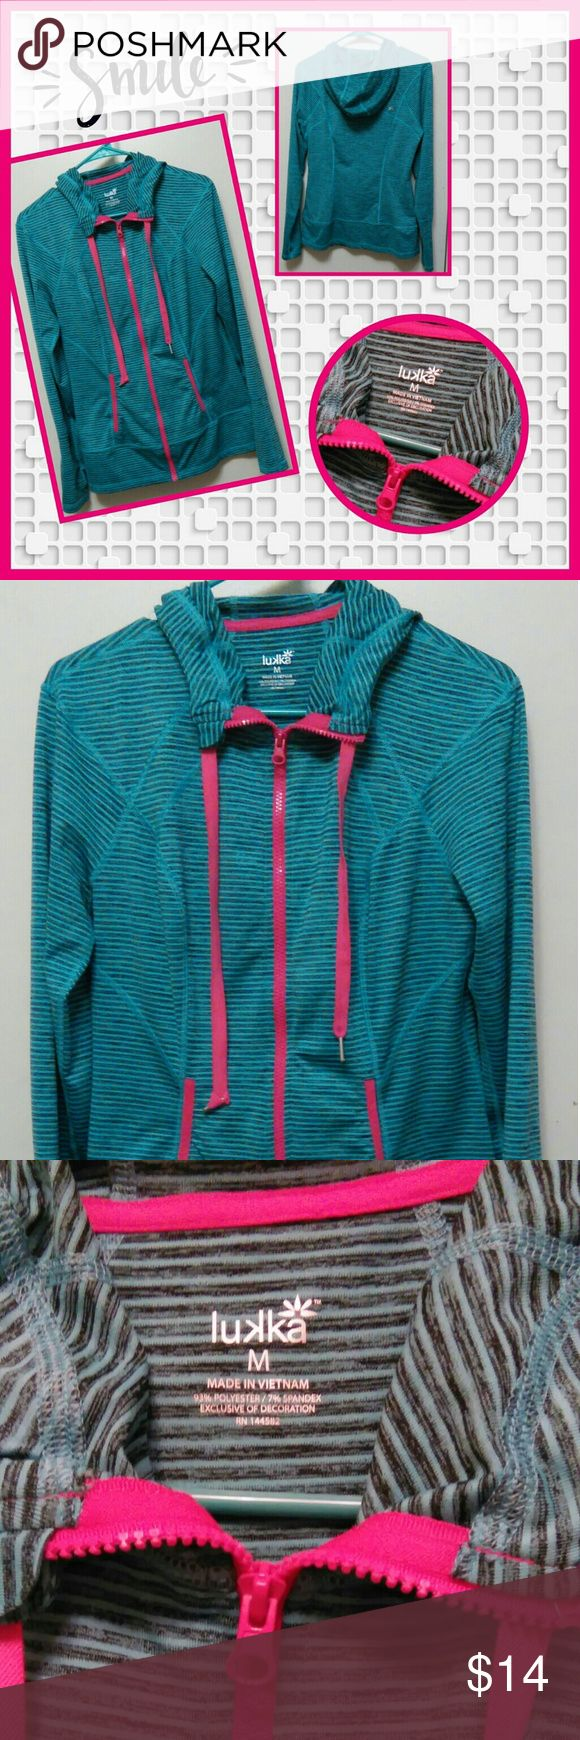 Fitness hoodie From Lakka... Sz med.... Like new.... No flaws... So comfortable.... Smoke free home lakka Tops Sweatshirts & Hoodies